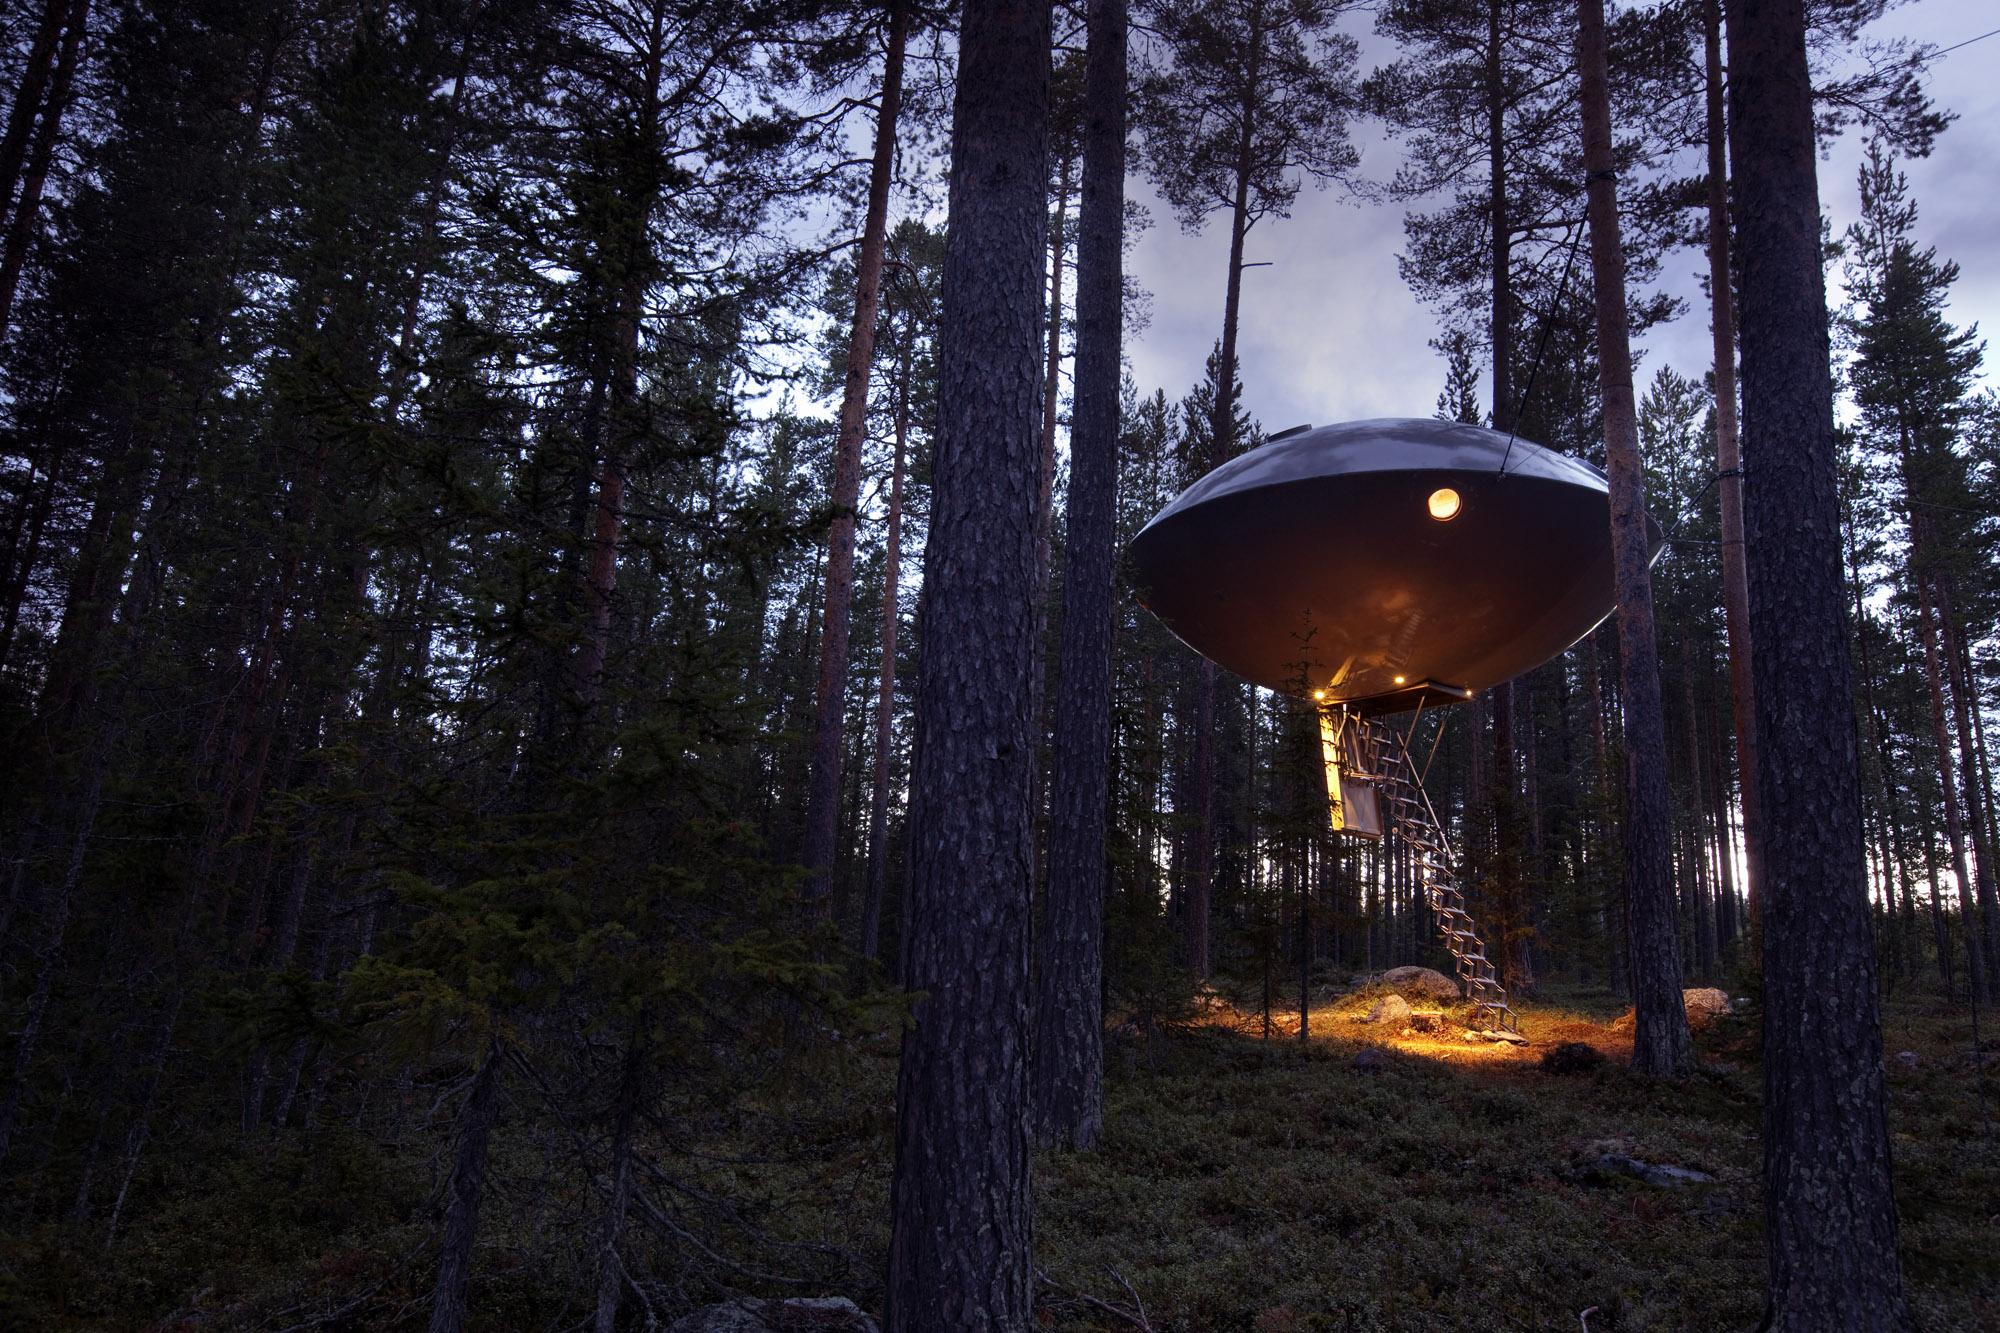 TreeHotel UFO Alternative Accommodations